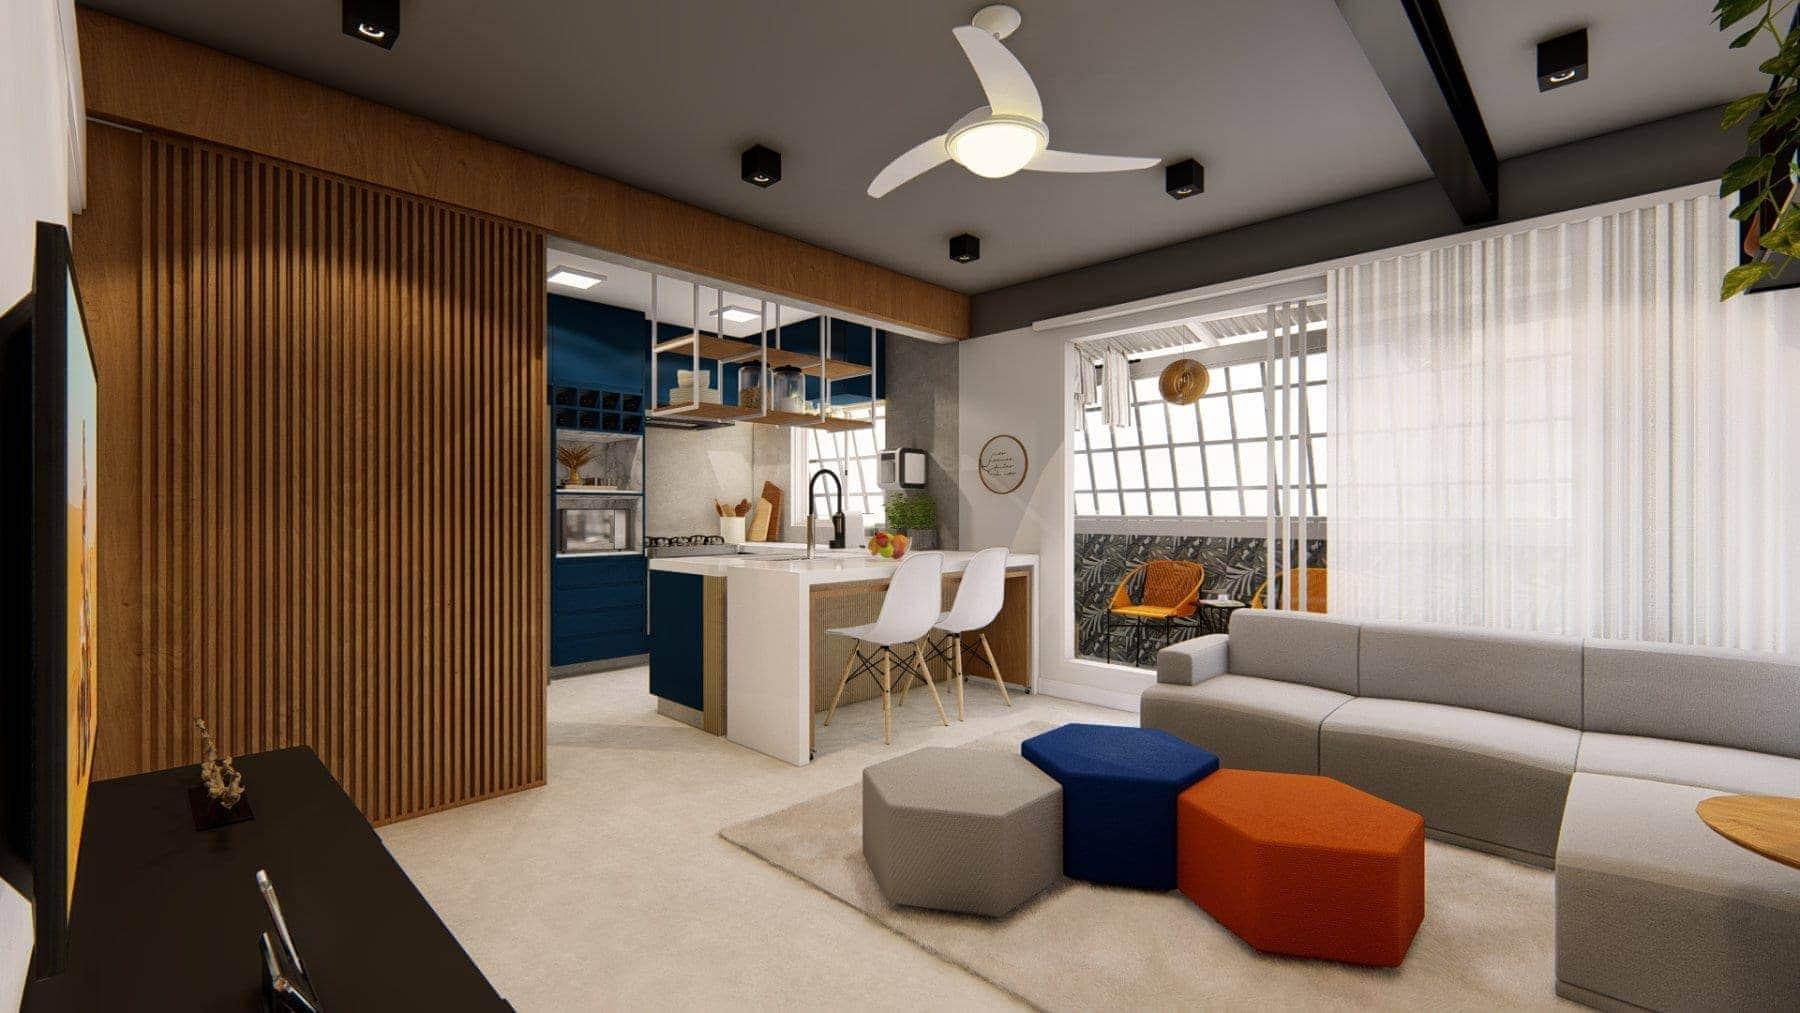 Projeto Interior - Motirõ Estudio &Bull; - 17 &Bull; Deezign